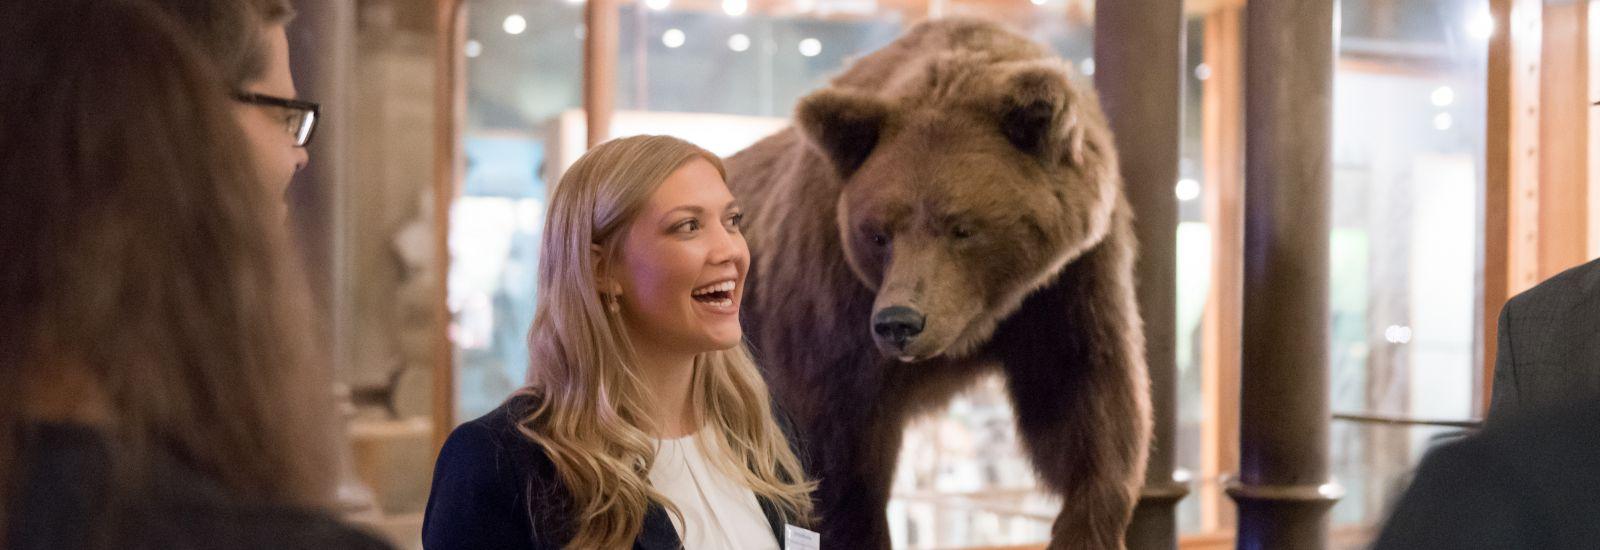 Clarendon Scholars & Bear